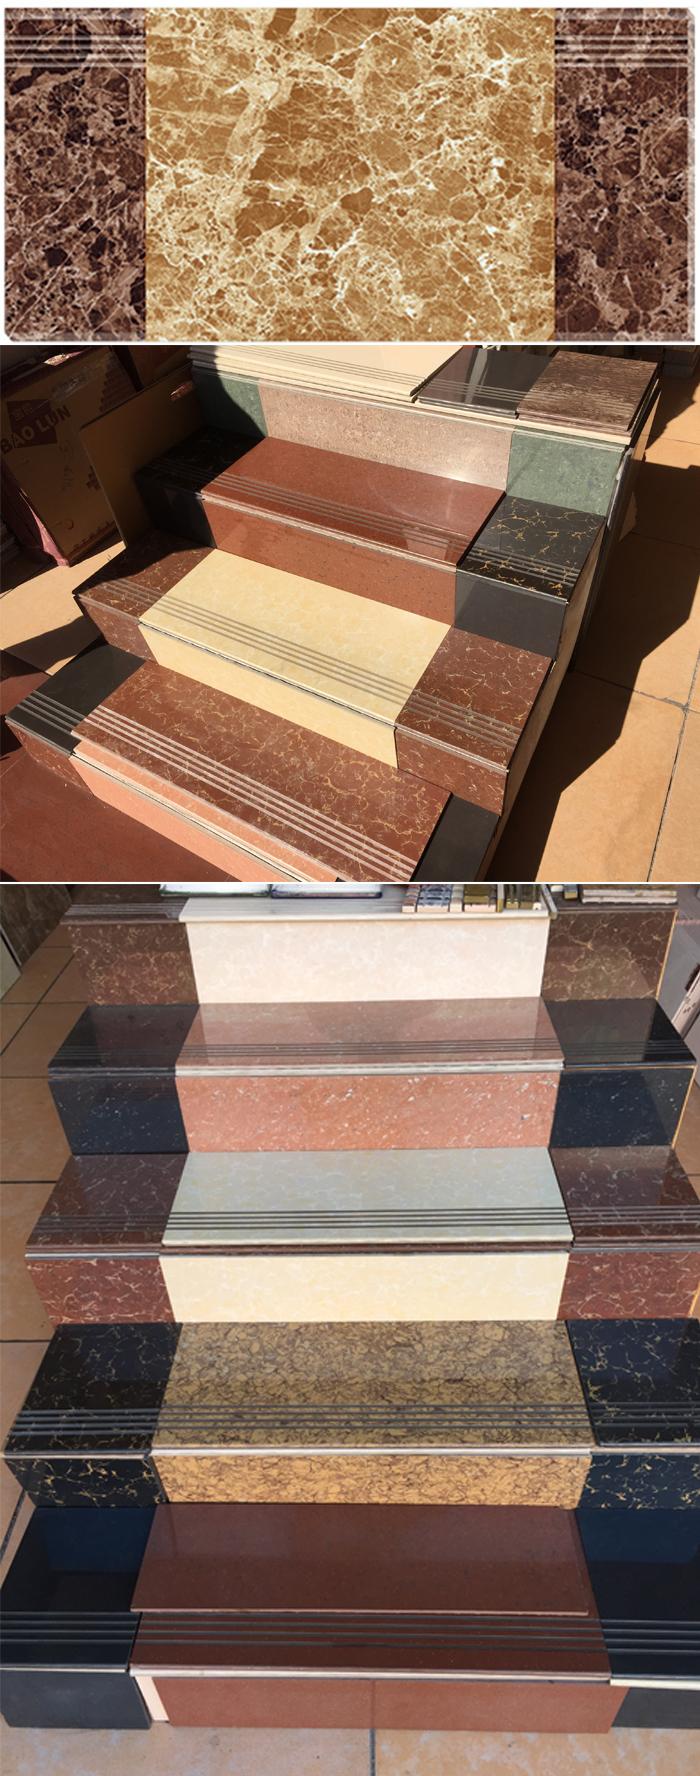 Hs10483 granite custom design ceramic tile stair nosing buy hs10483 granite custom design ceramic tile stair nosing dailygadgetfo Choice Image